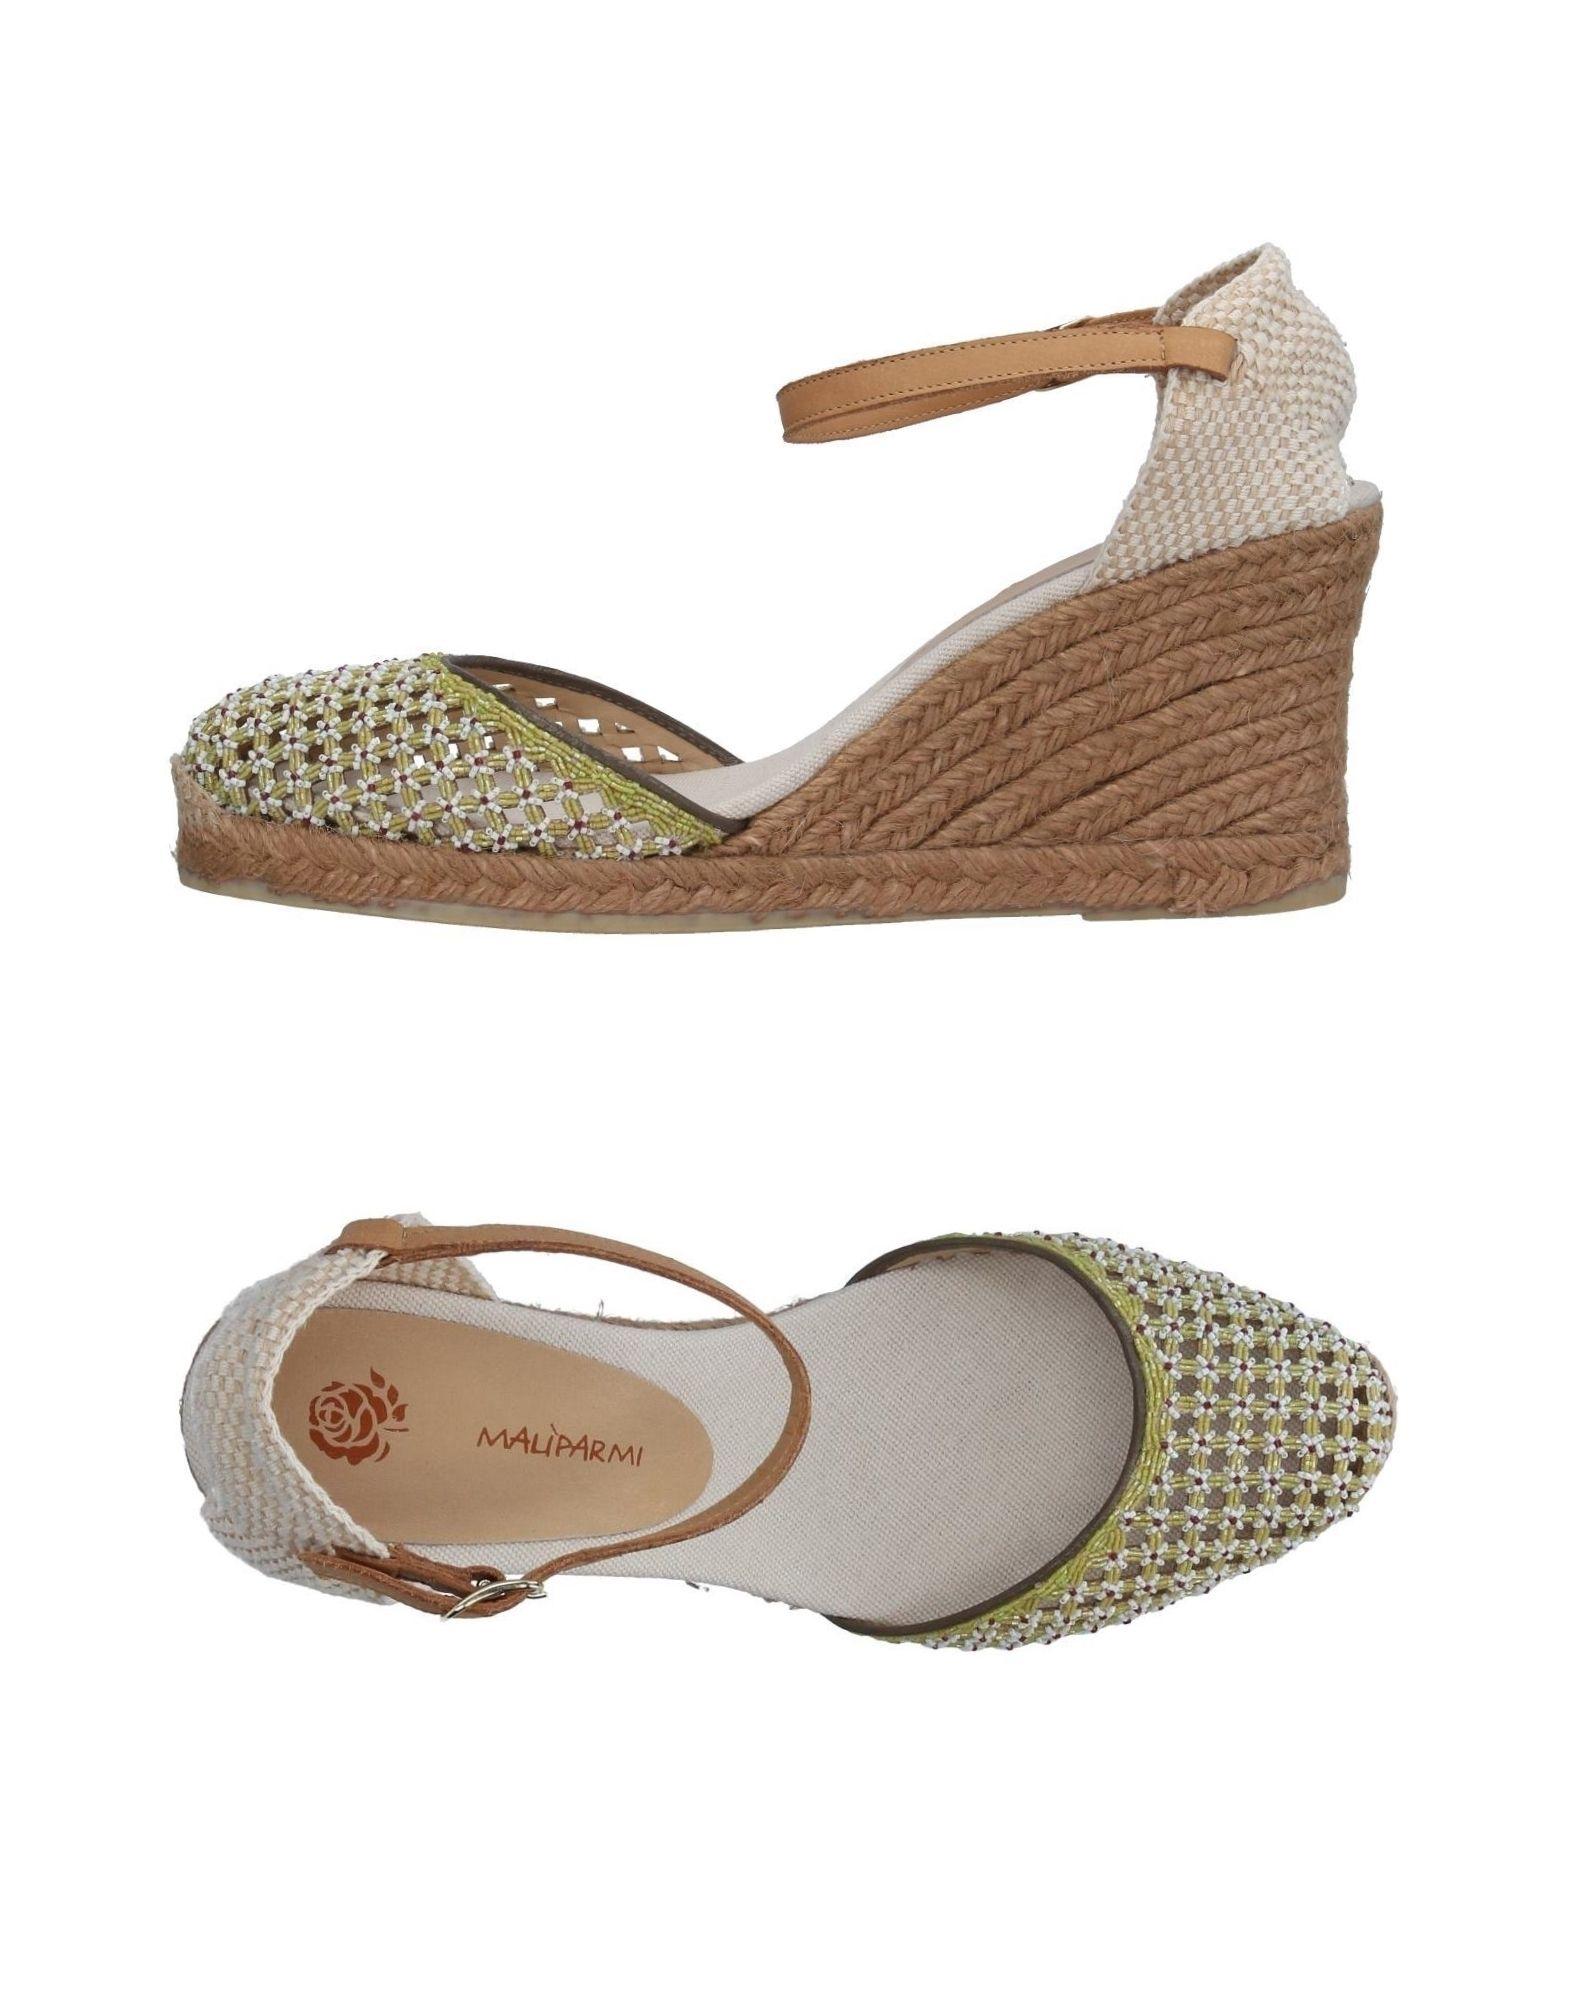 Malìparmi Espadrilles Damen  11314684OG Gute Qualität beliebte Schuhe